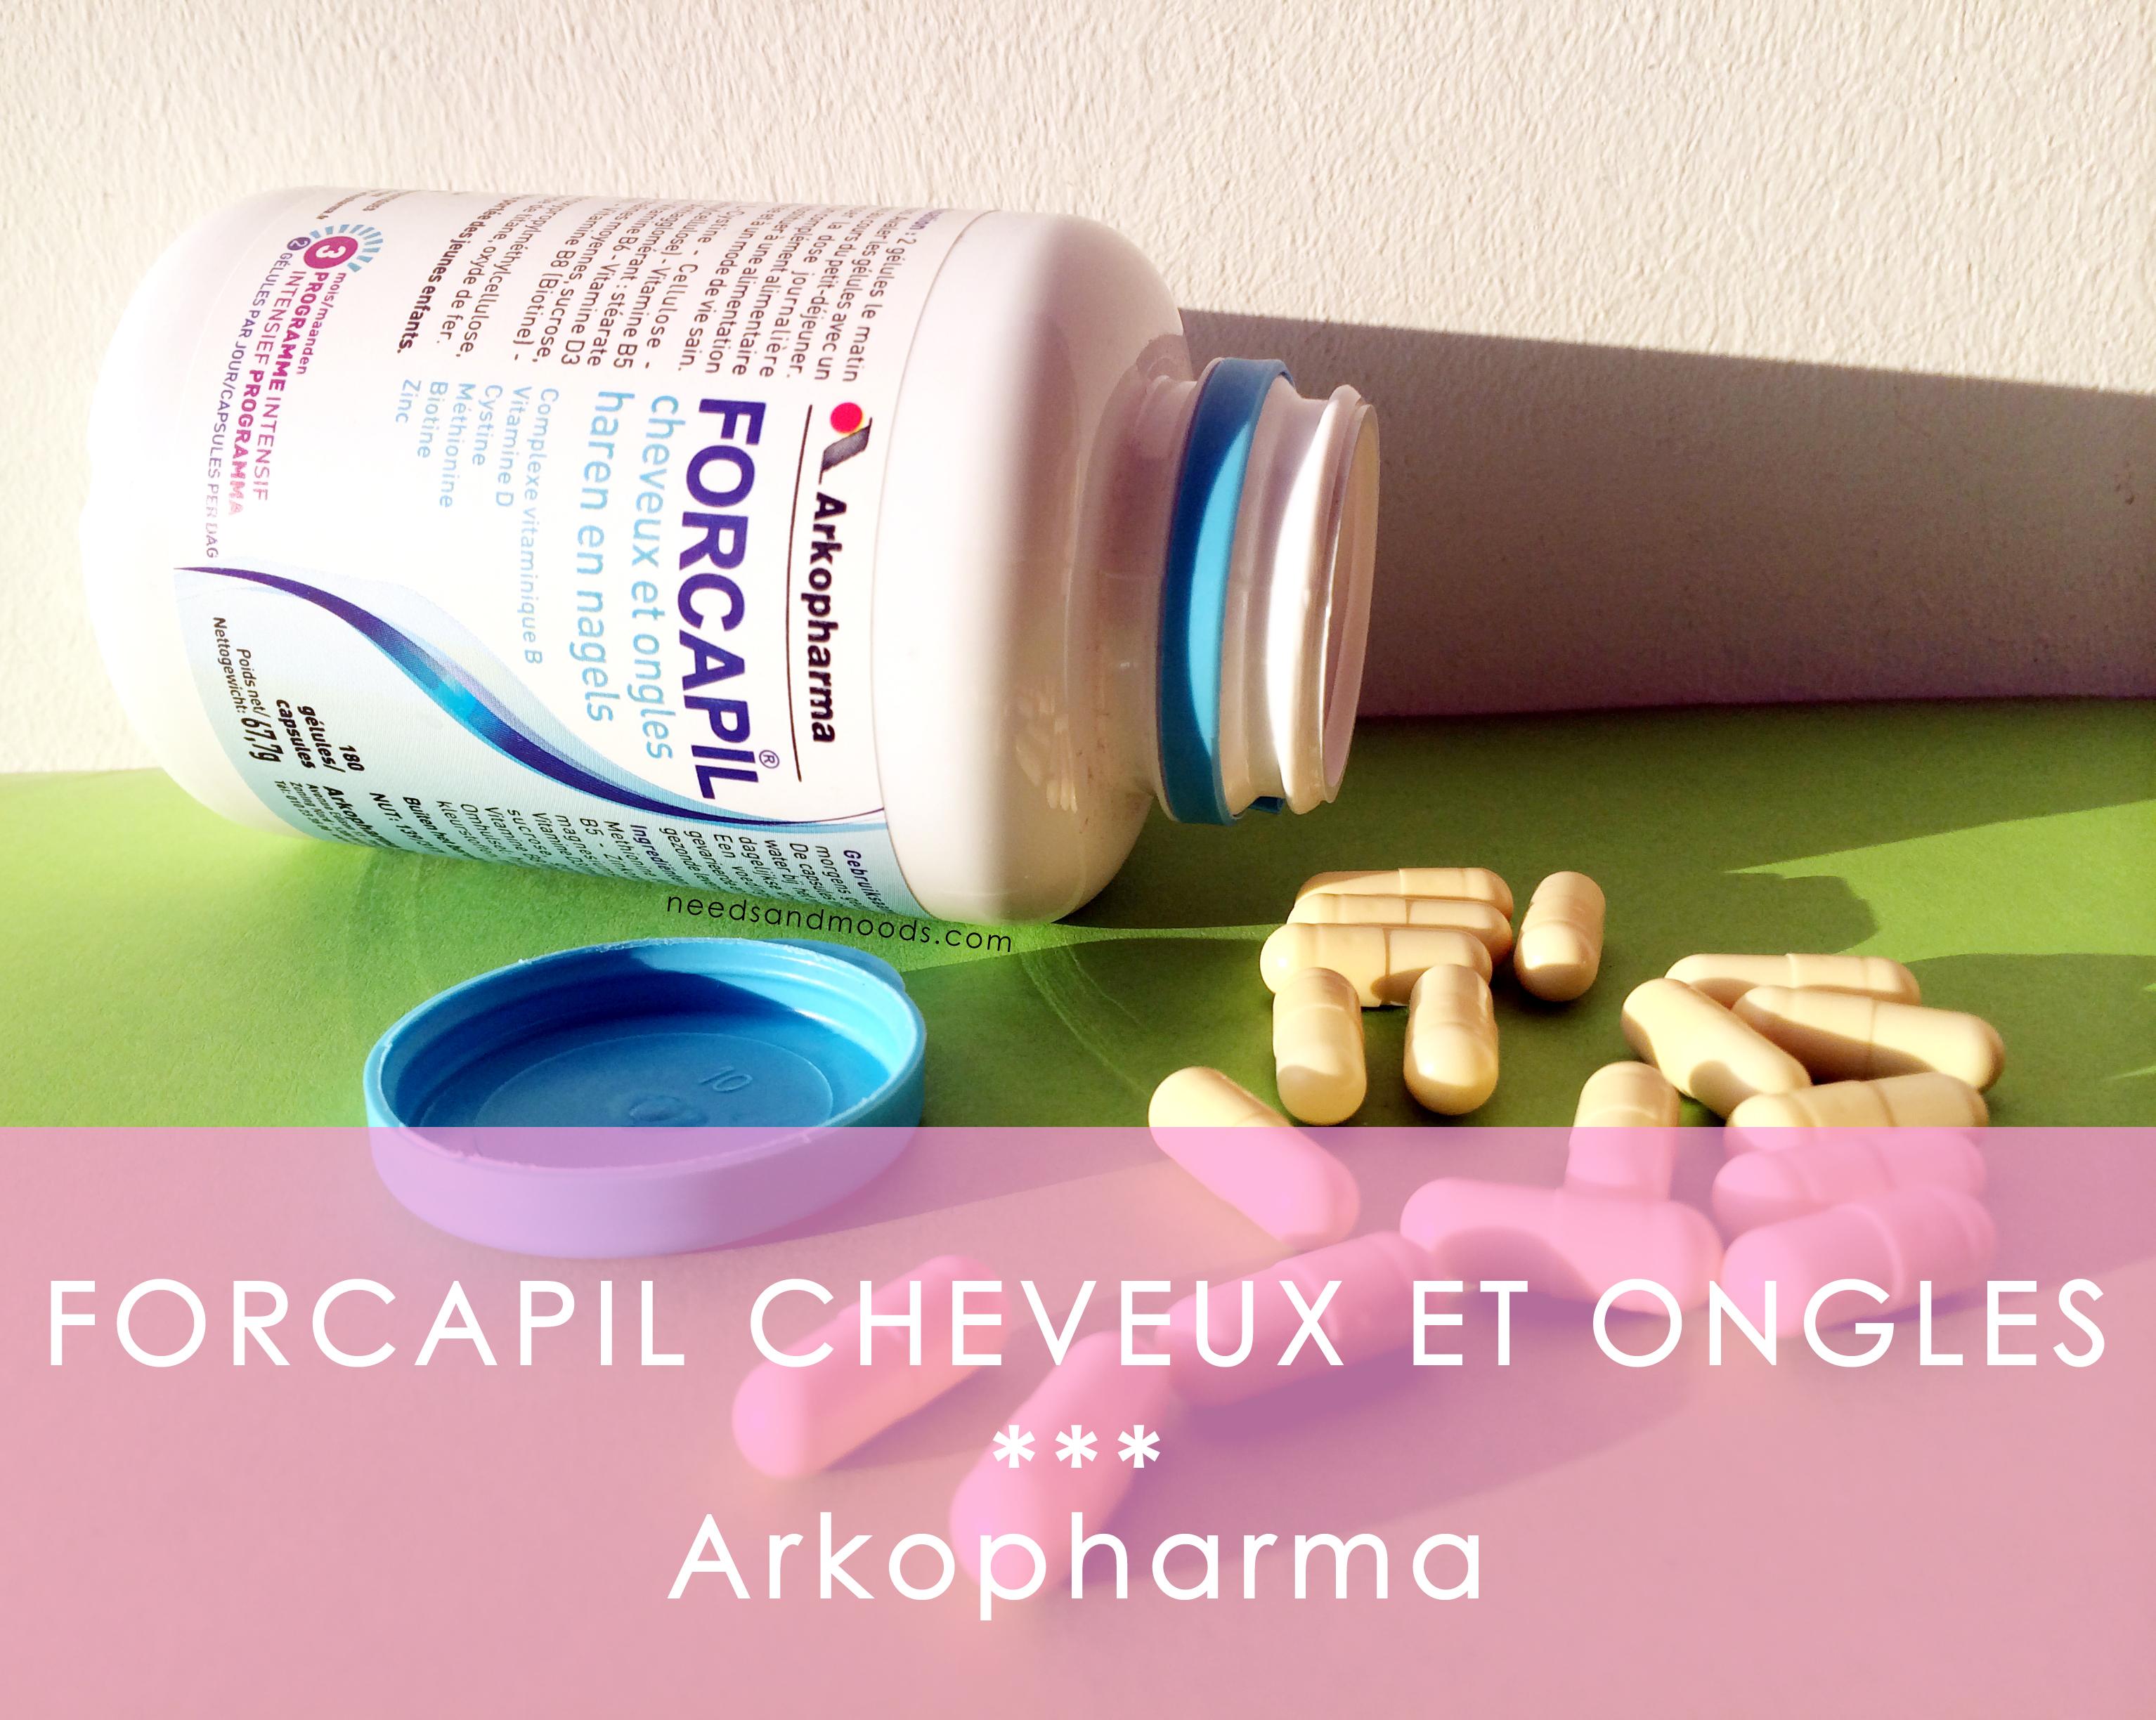 Forcapil cheveux et ongles - Arkopharma